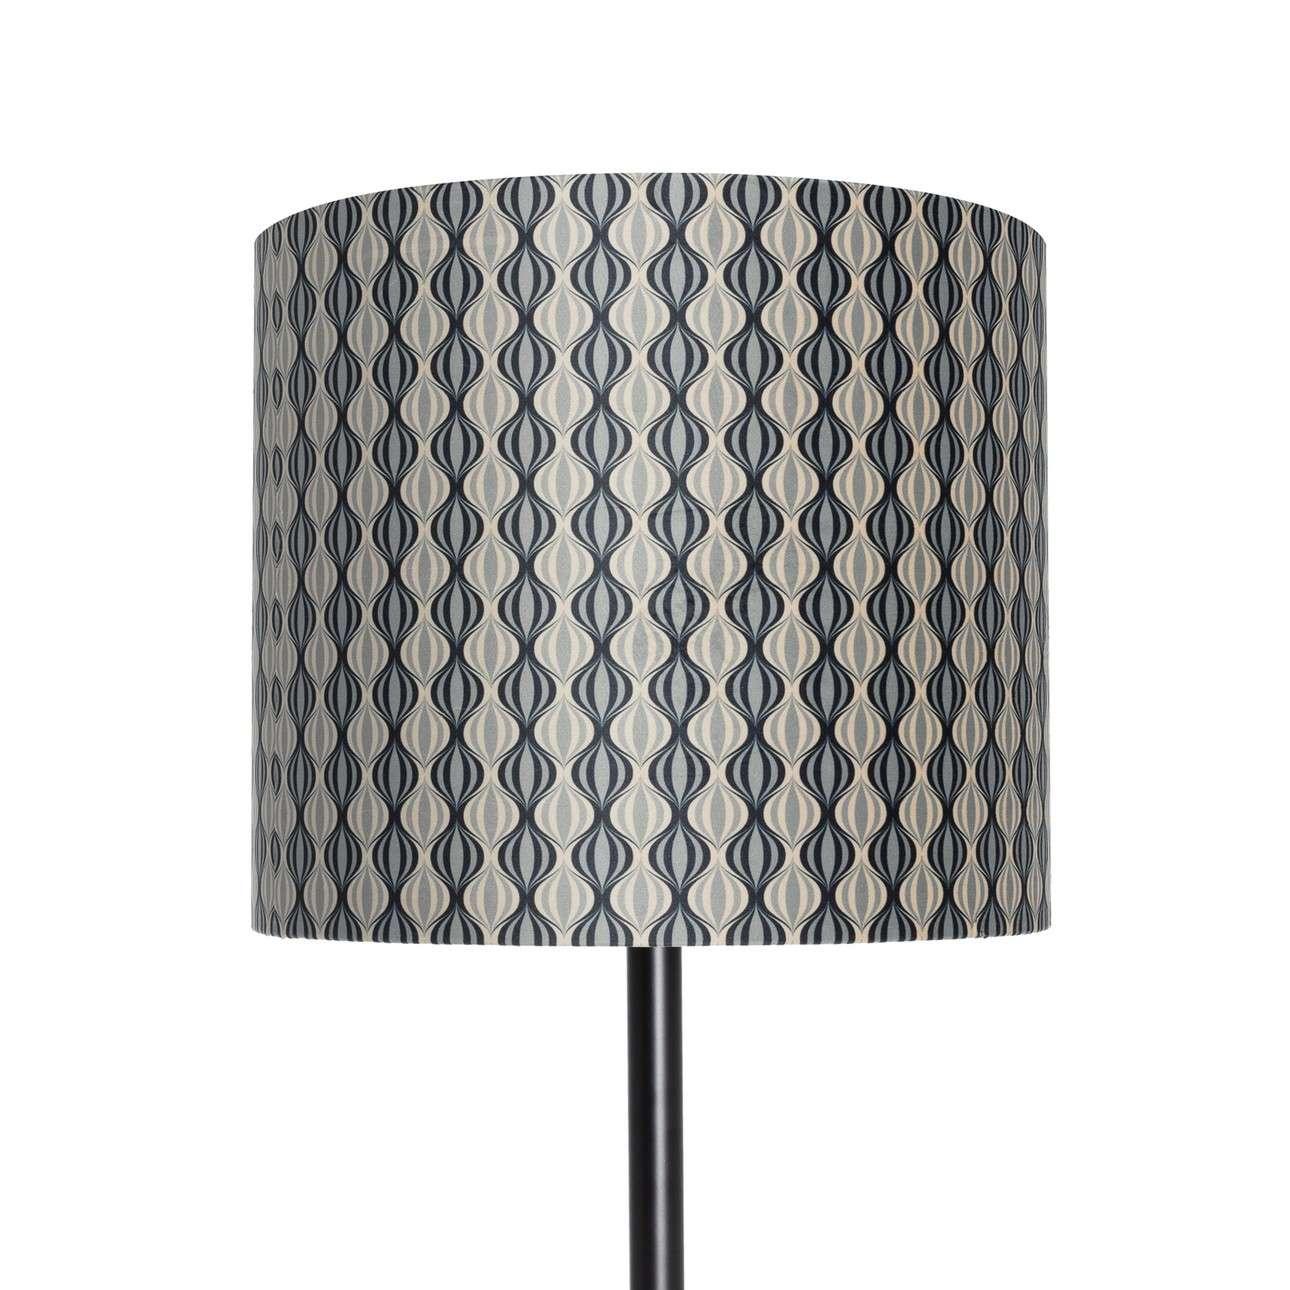 Stehlampe Hailey Black&Gray Patterns 163cm